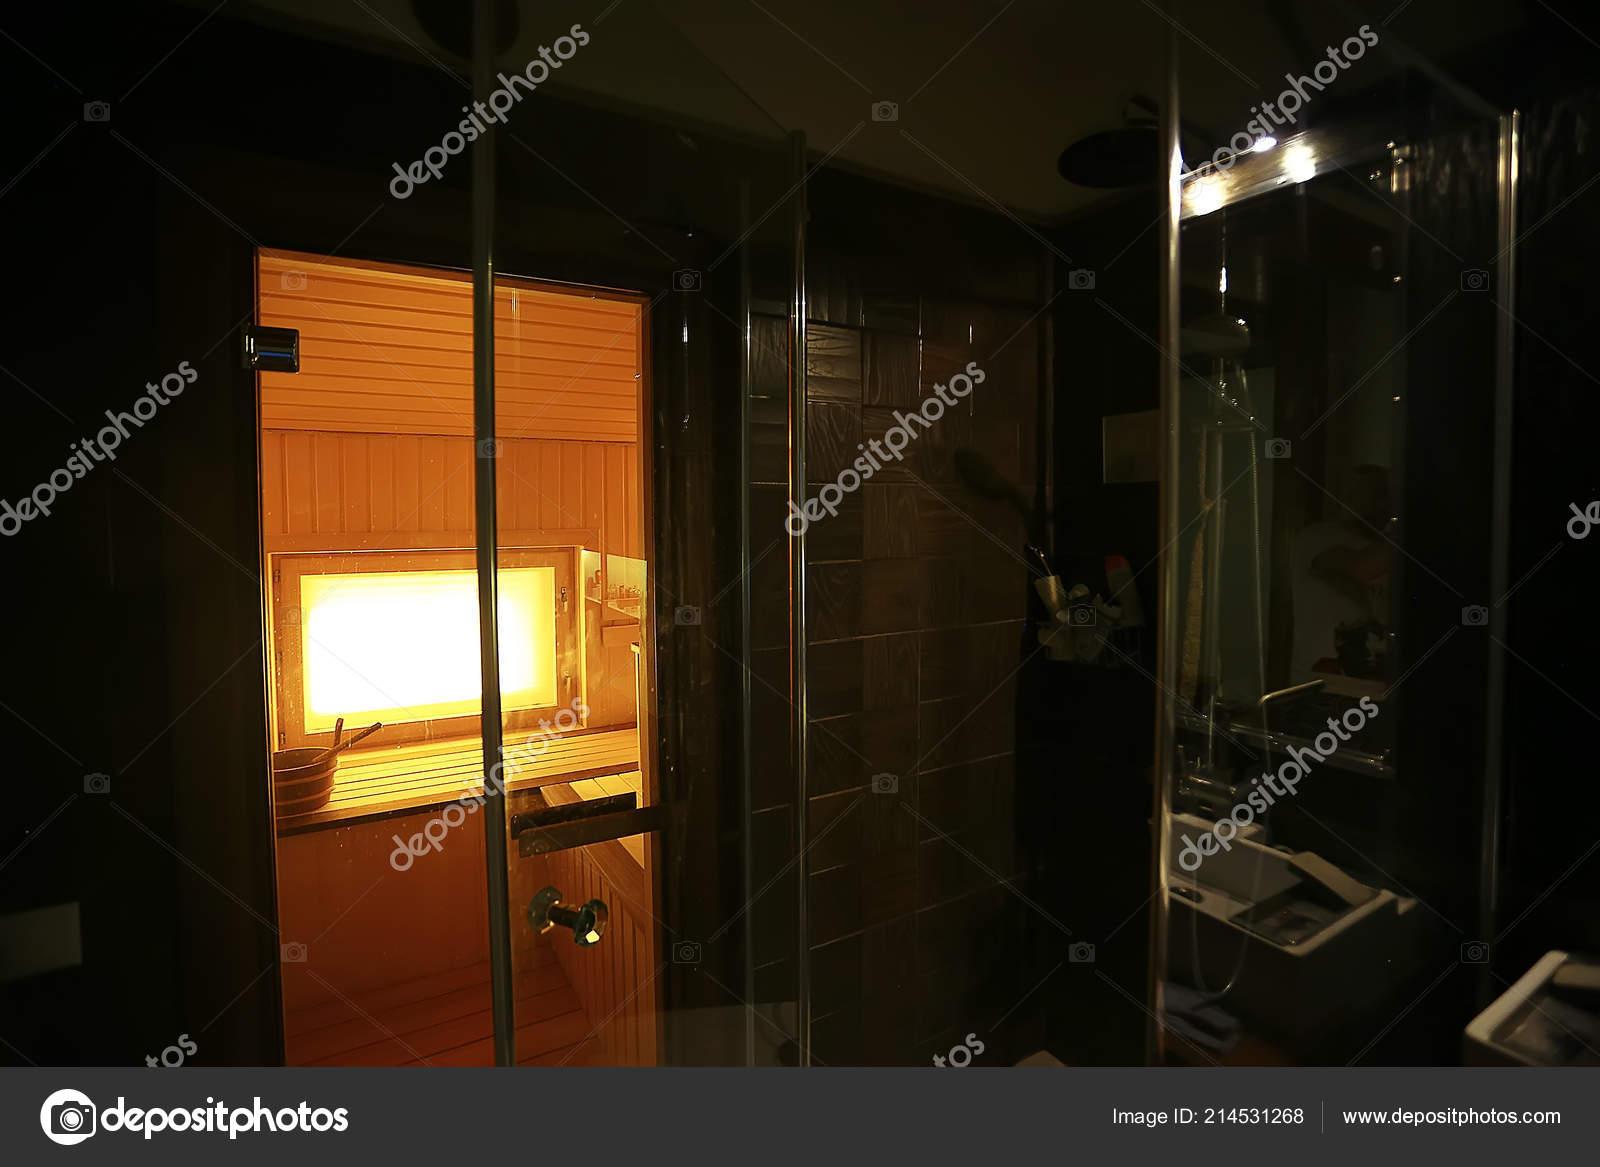 Panche Legno Per Interni.Sauna Bagni Interni Legno Panche Legno Accessori Sedie Sdraio Sauna